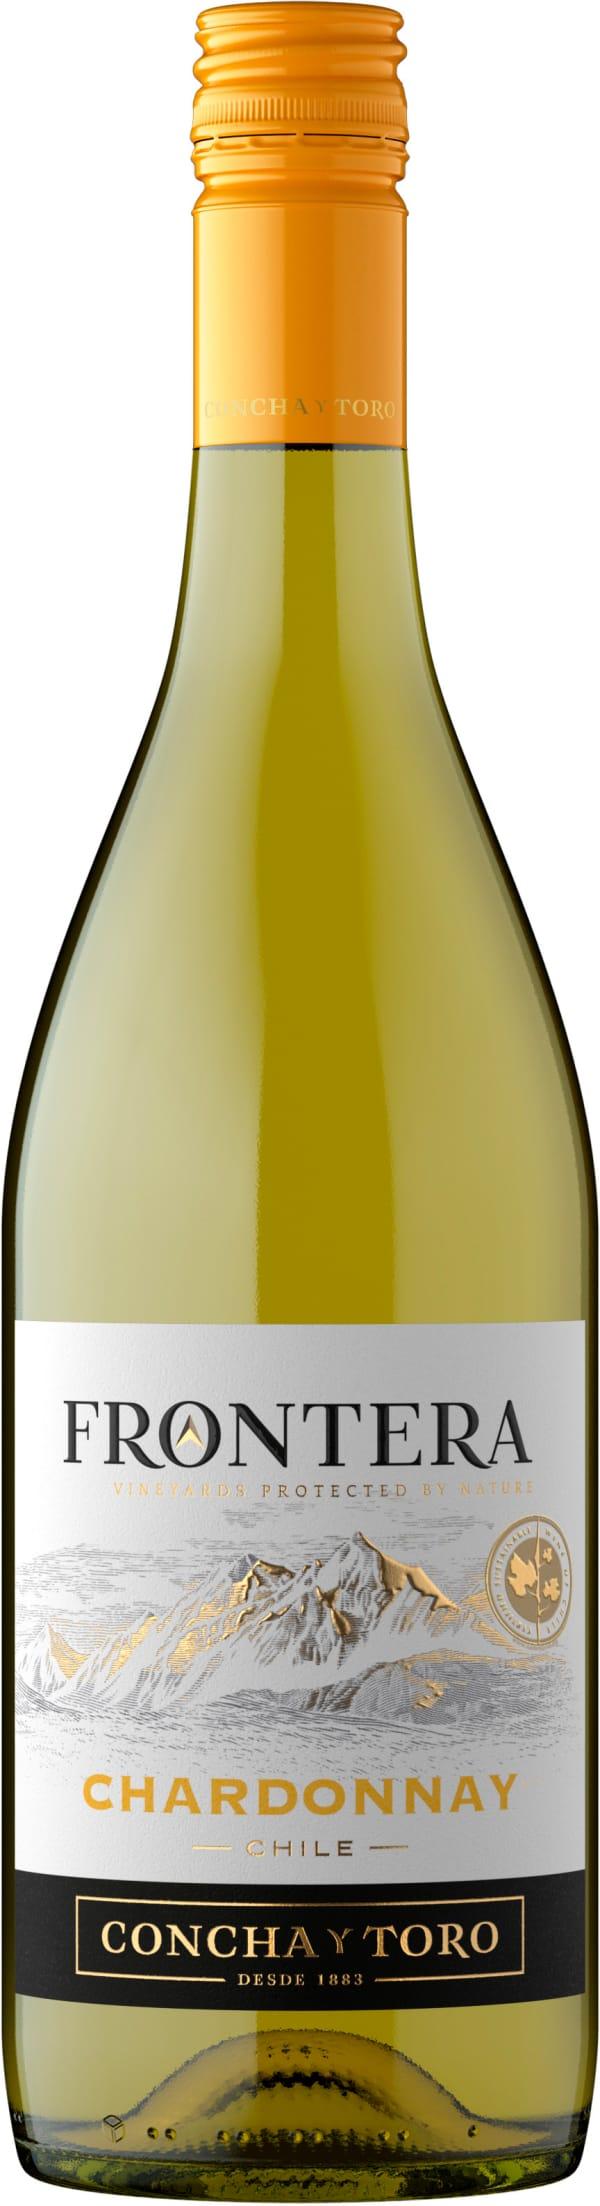 Frontera Chardonnay 2018